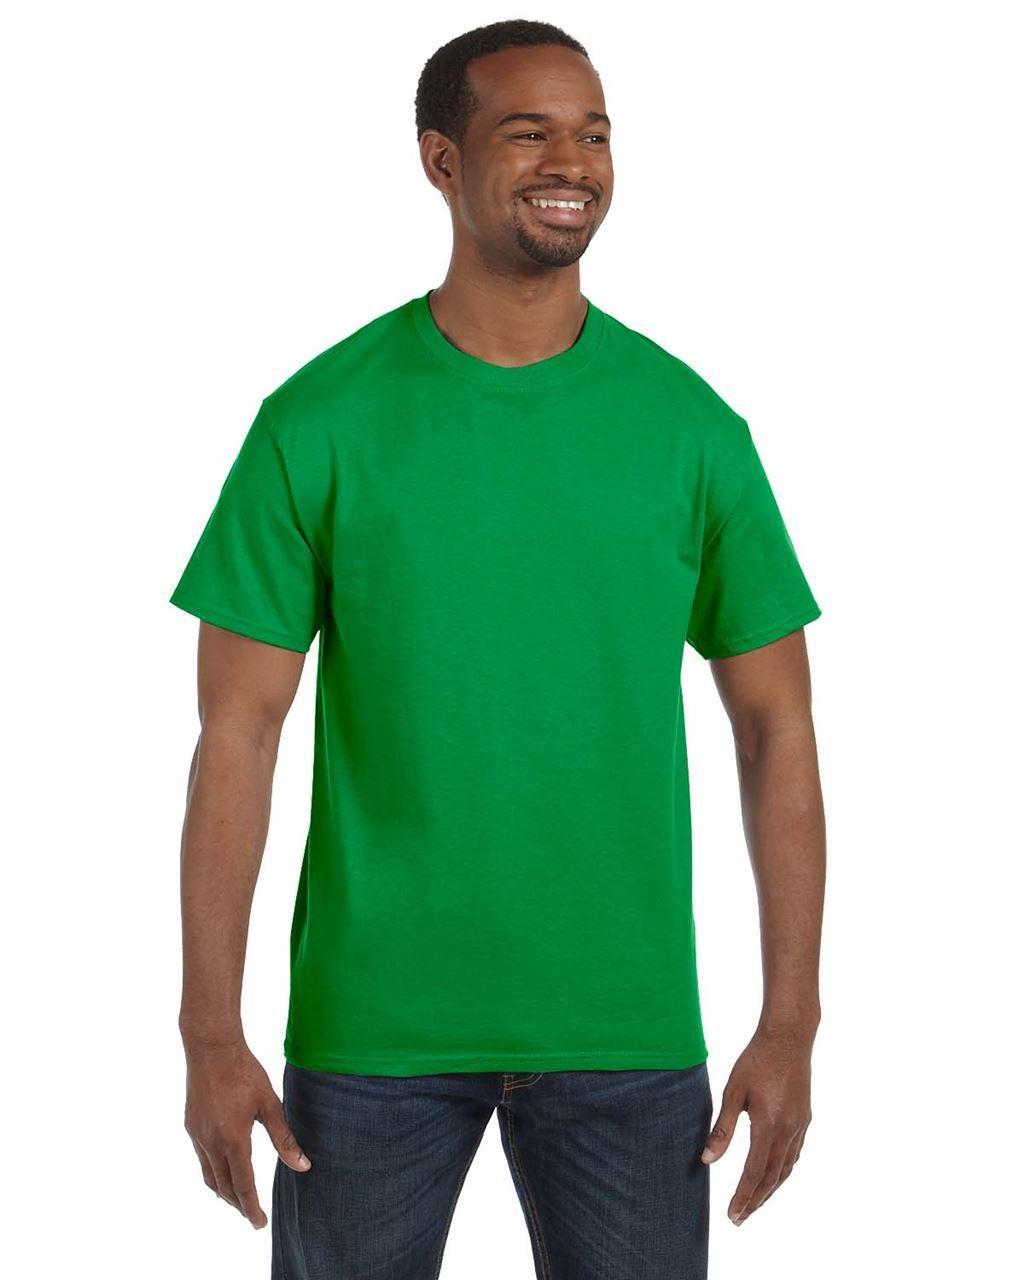 bdce6eca fruit of the loom 5930 5.6 oz., 50/50 best™ t-shirt | Fruit Of The ...